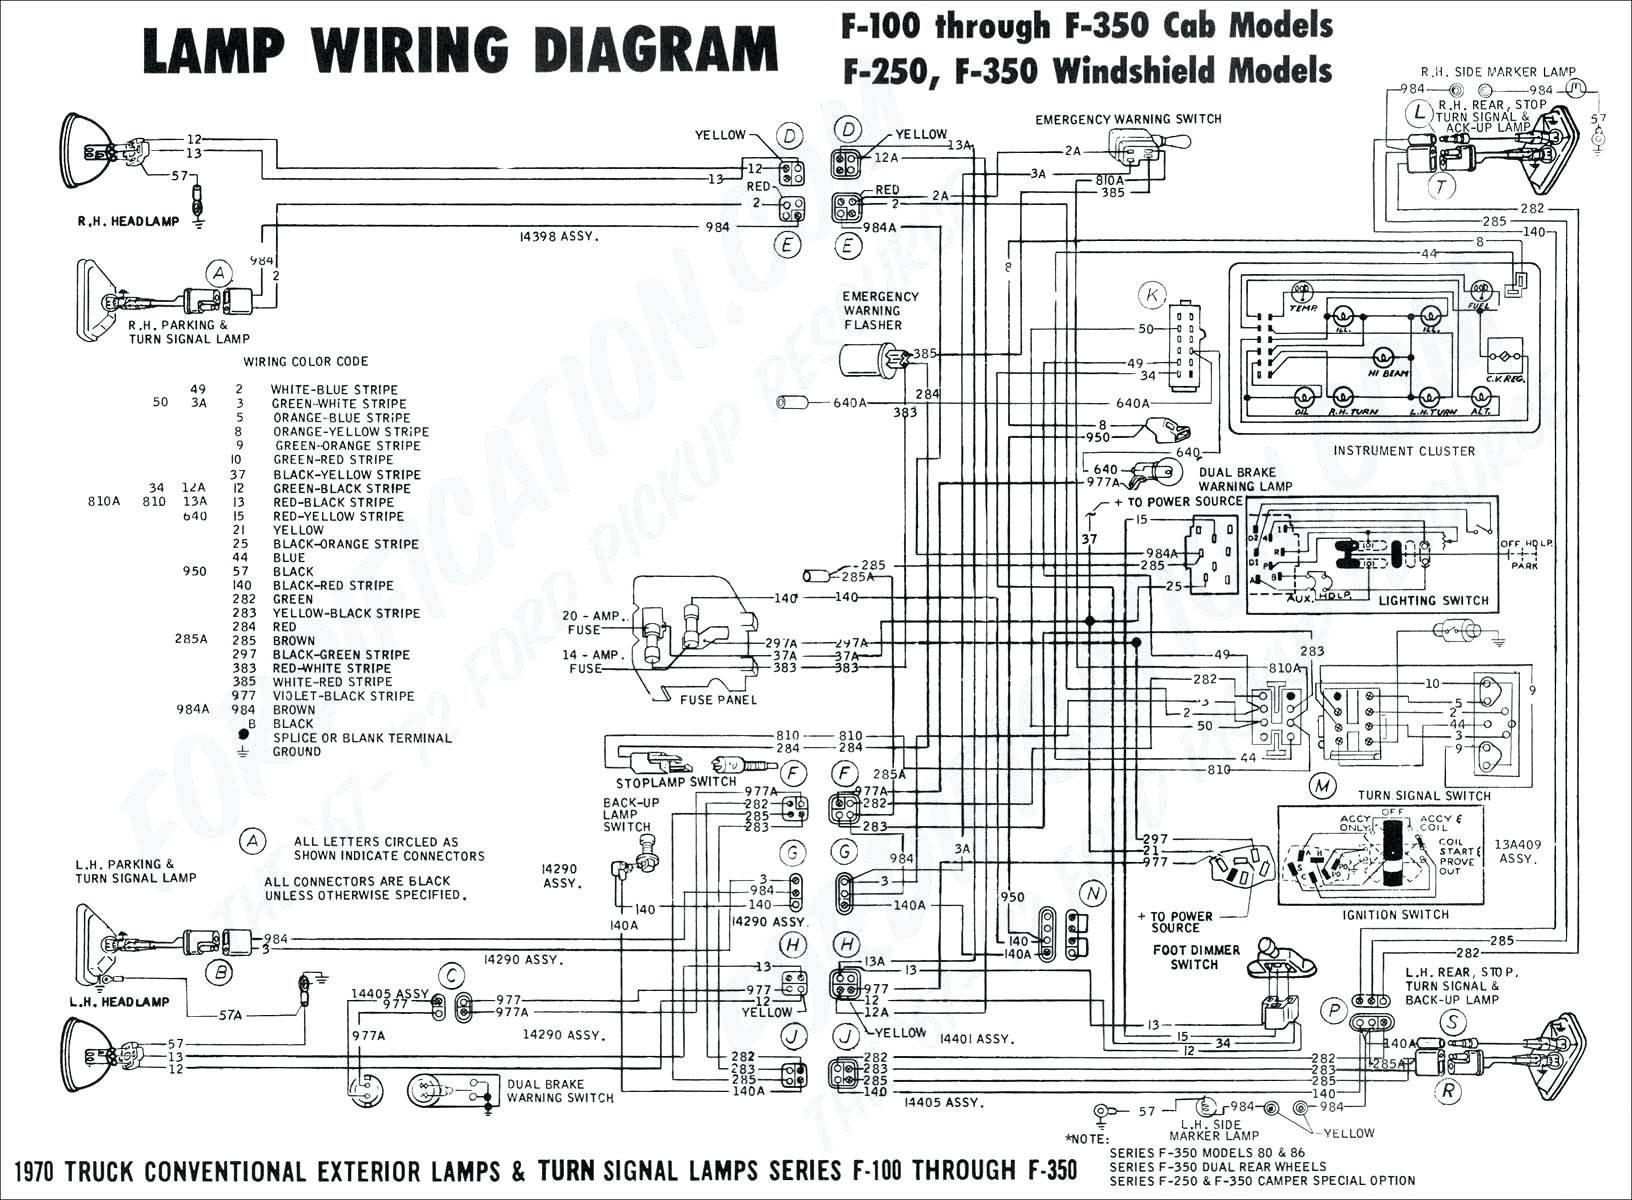 Dodge Ram Trailer Wiring Diagram 2005 Dodge Ram 2500 Electrical Diagram Experts Wiring Diagram • Of Dodge Ram Trailer Wiring Diagram